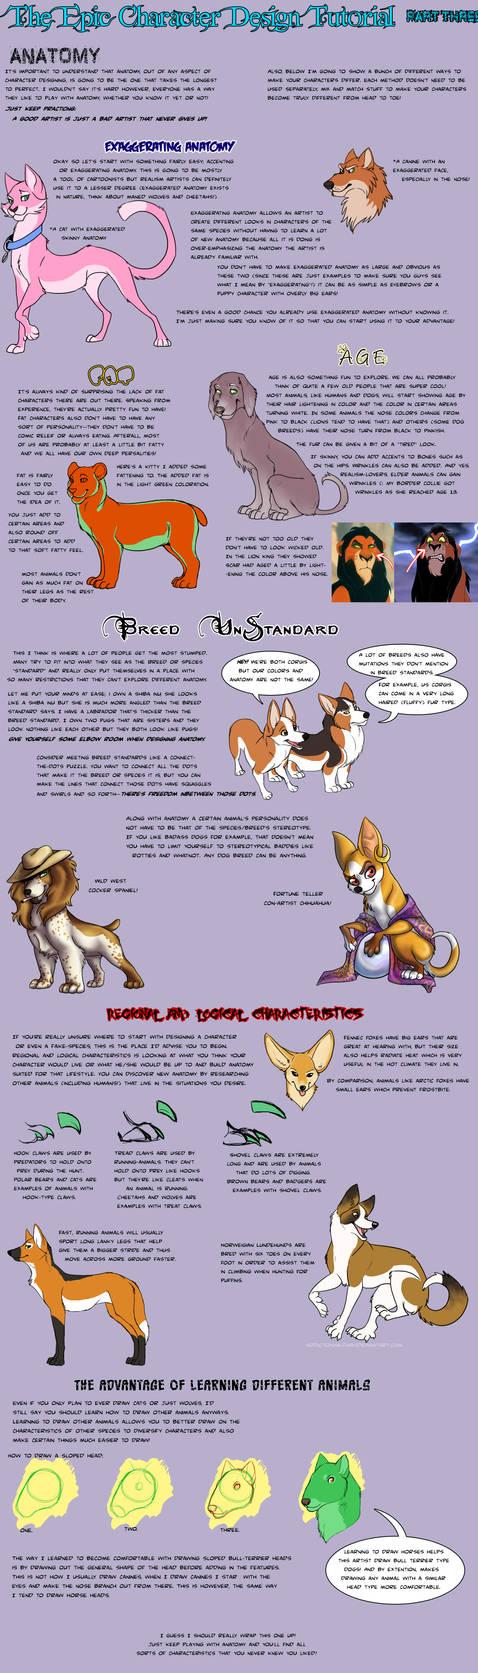 Character Design Tut: Anatomy by AddictionHalfWay